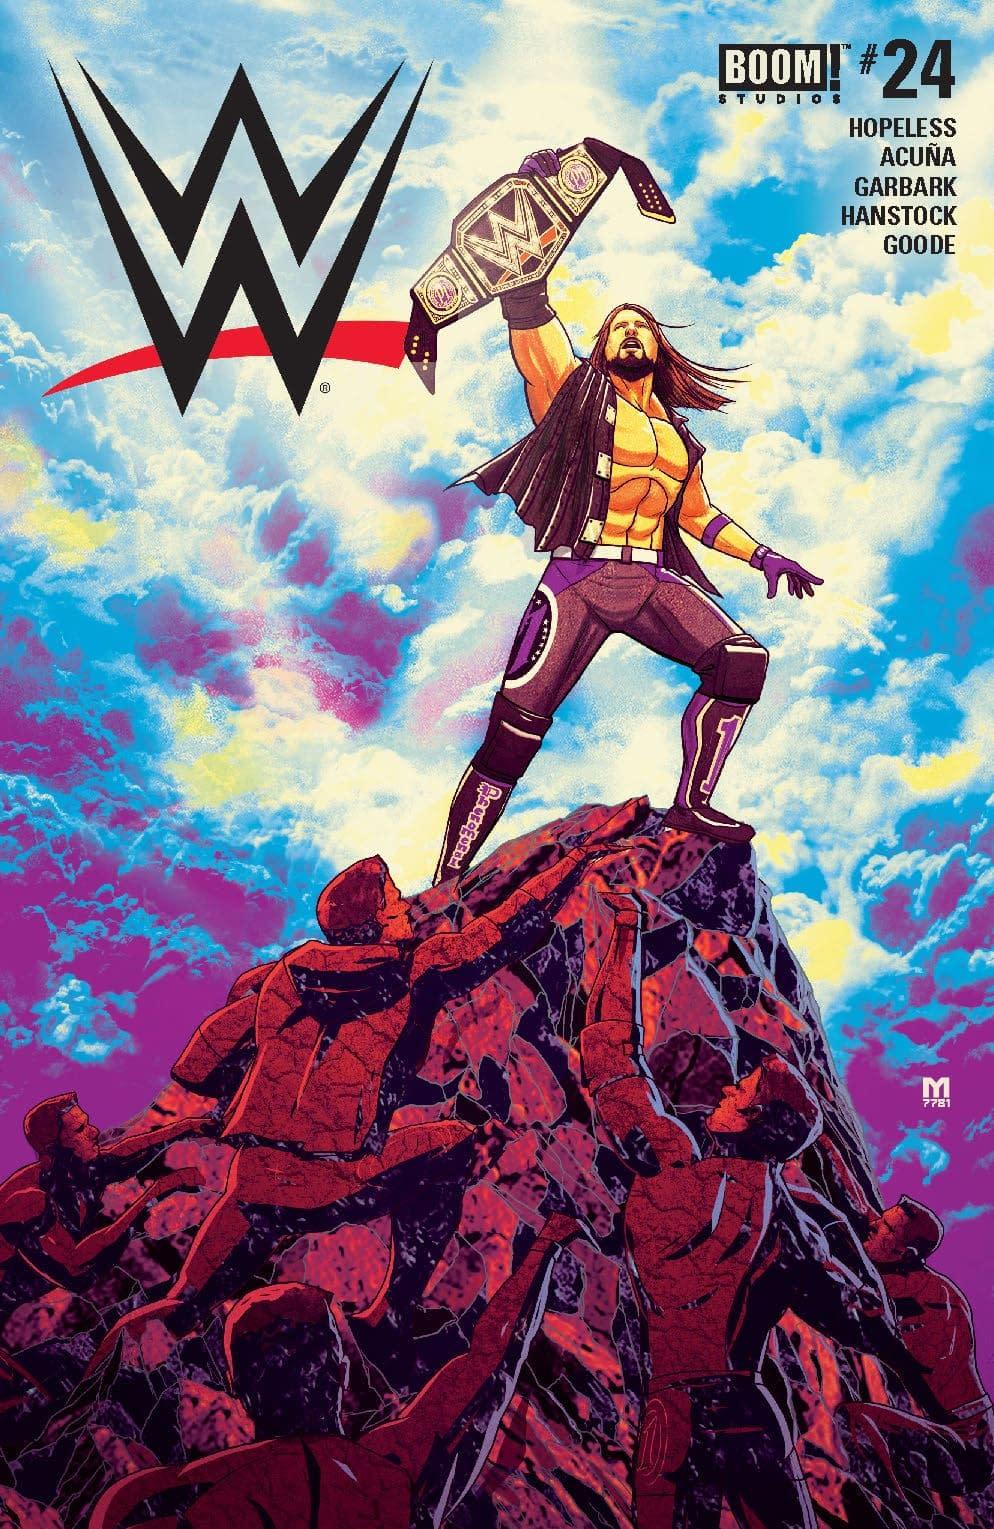 Shinsuke Nakamura Has an Impossible Dream in Next Week's WWE #24